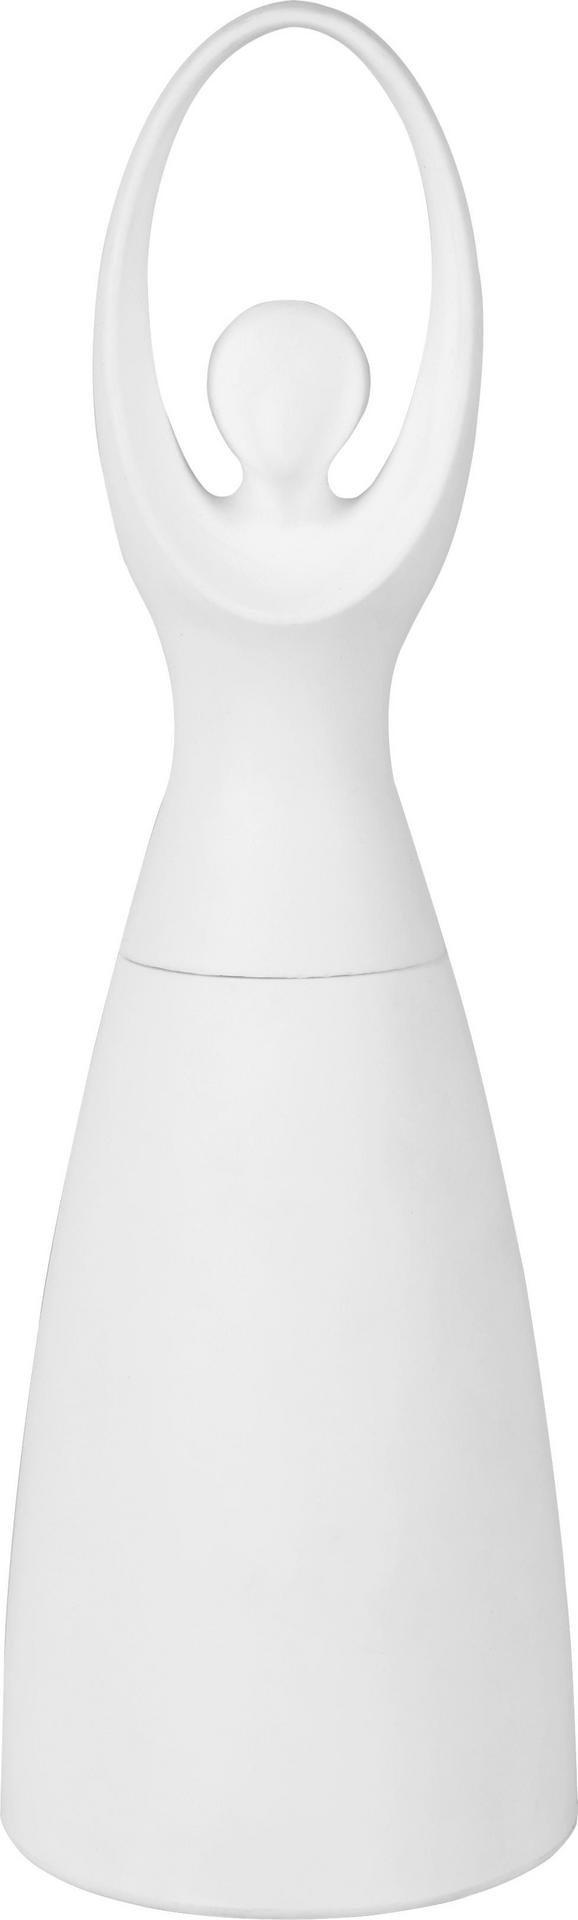 Salz- oder Pfeffermühle Ballerina - Weiß, Keramik/Kunststoff (6/19cm) - MÖMAX modern living